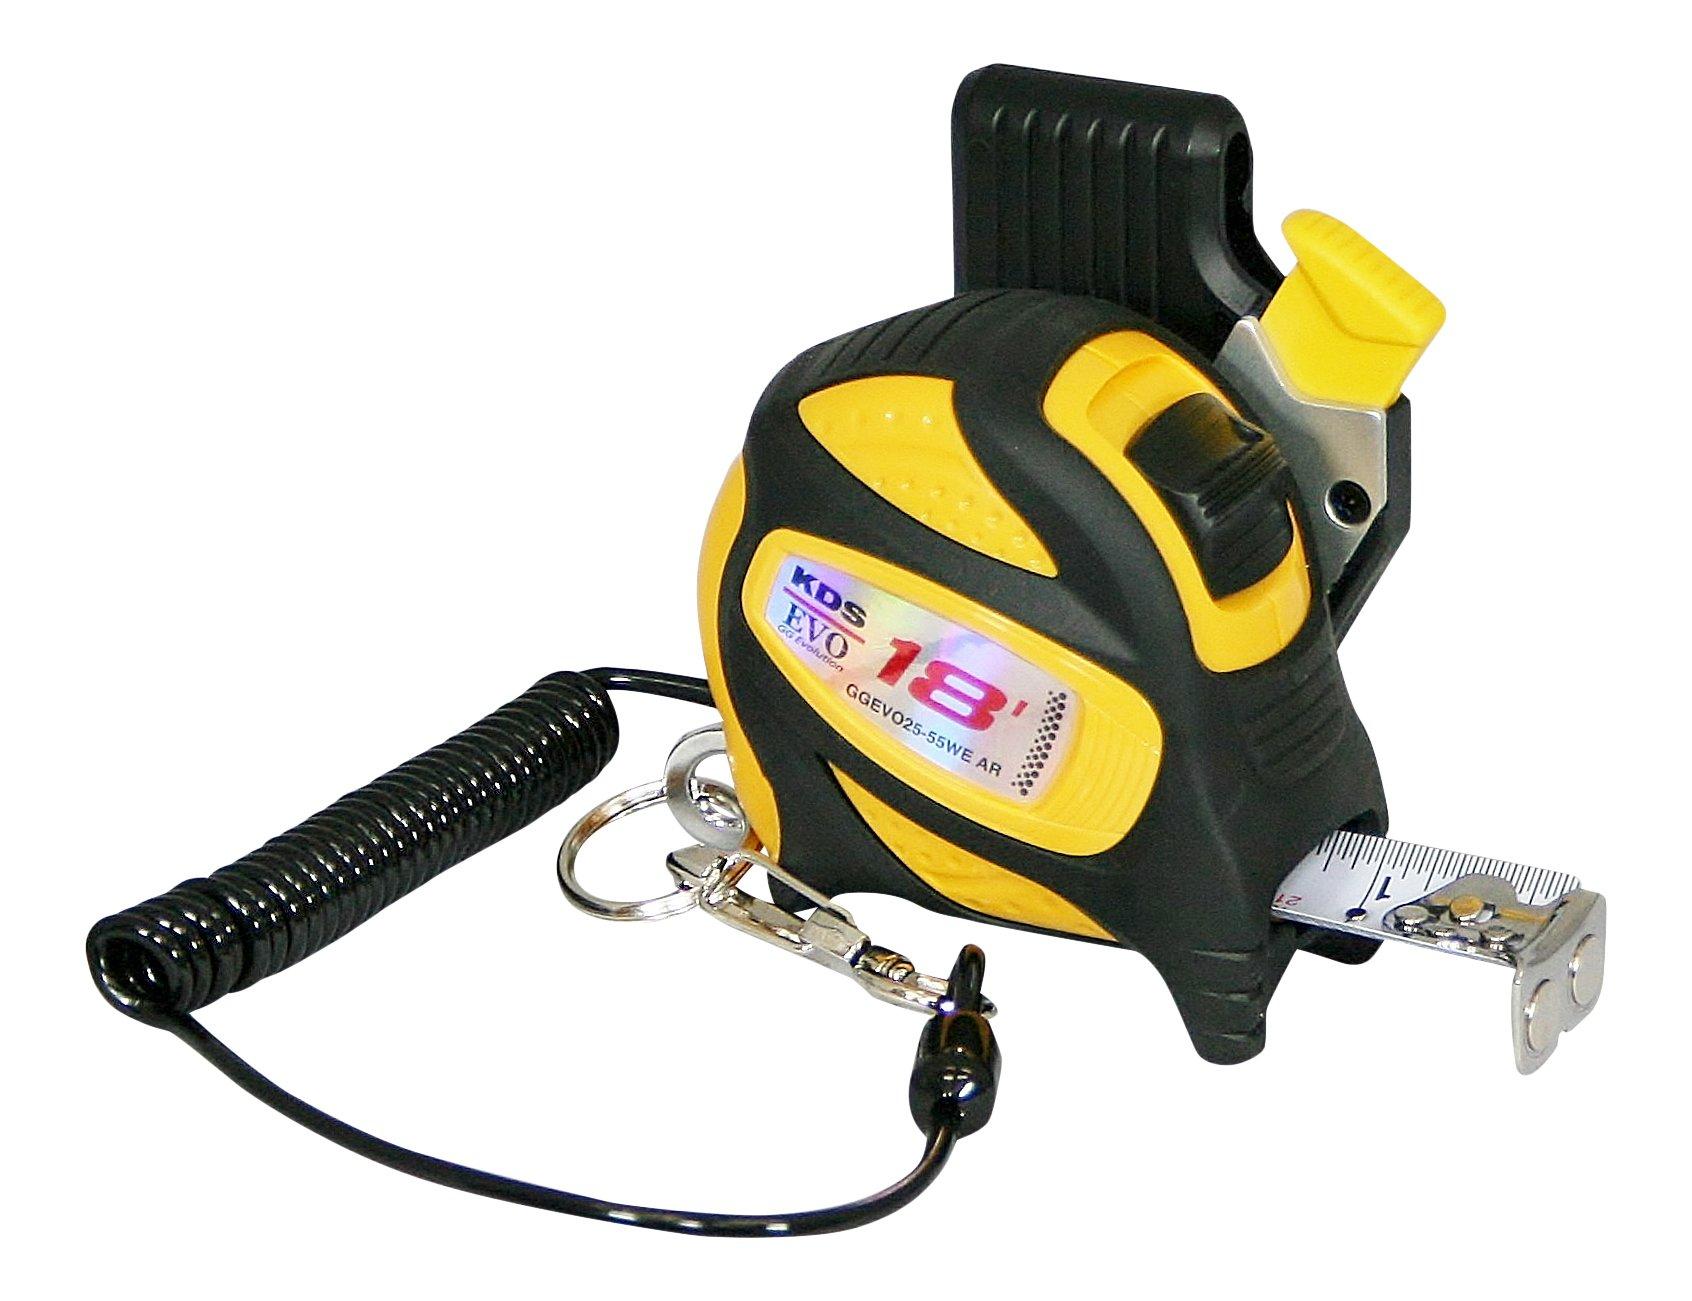 KDS GGEVO25-55WE AR BP GoodGrip Drop Protection Safety Measuring Tape, 1''/18', Yellow/Black